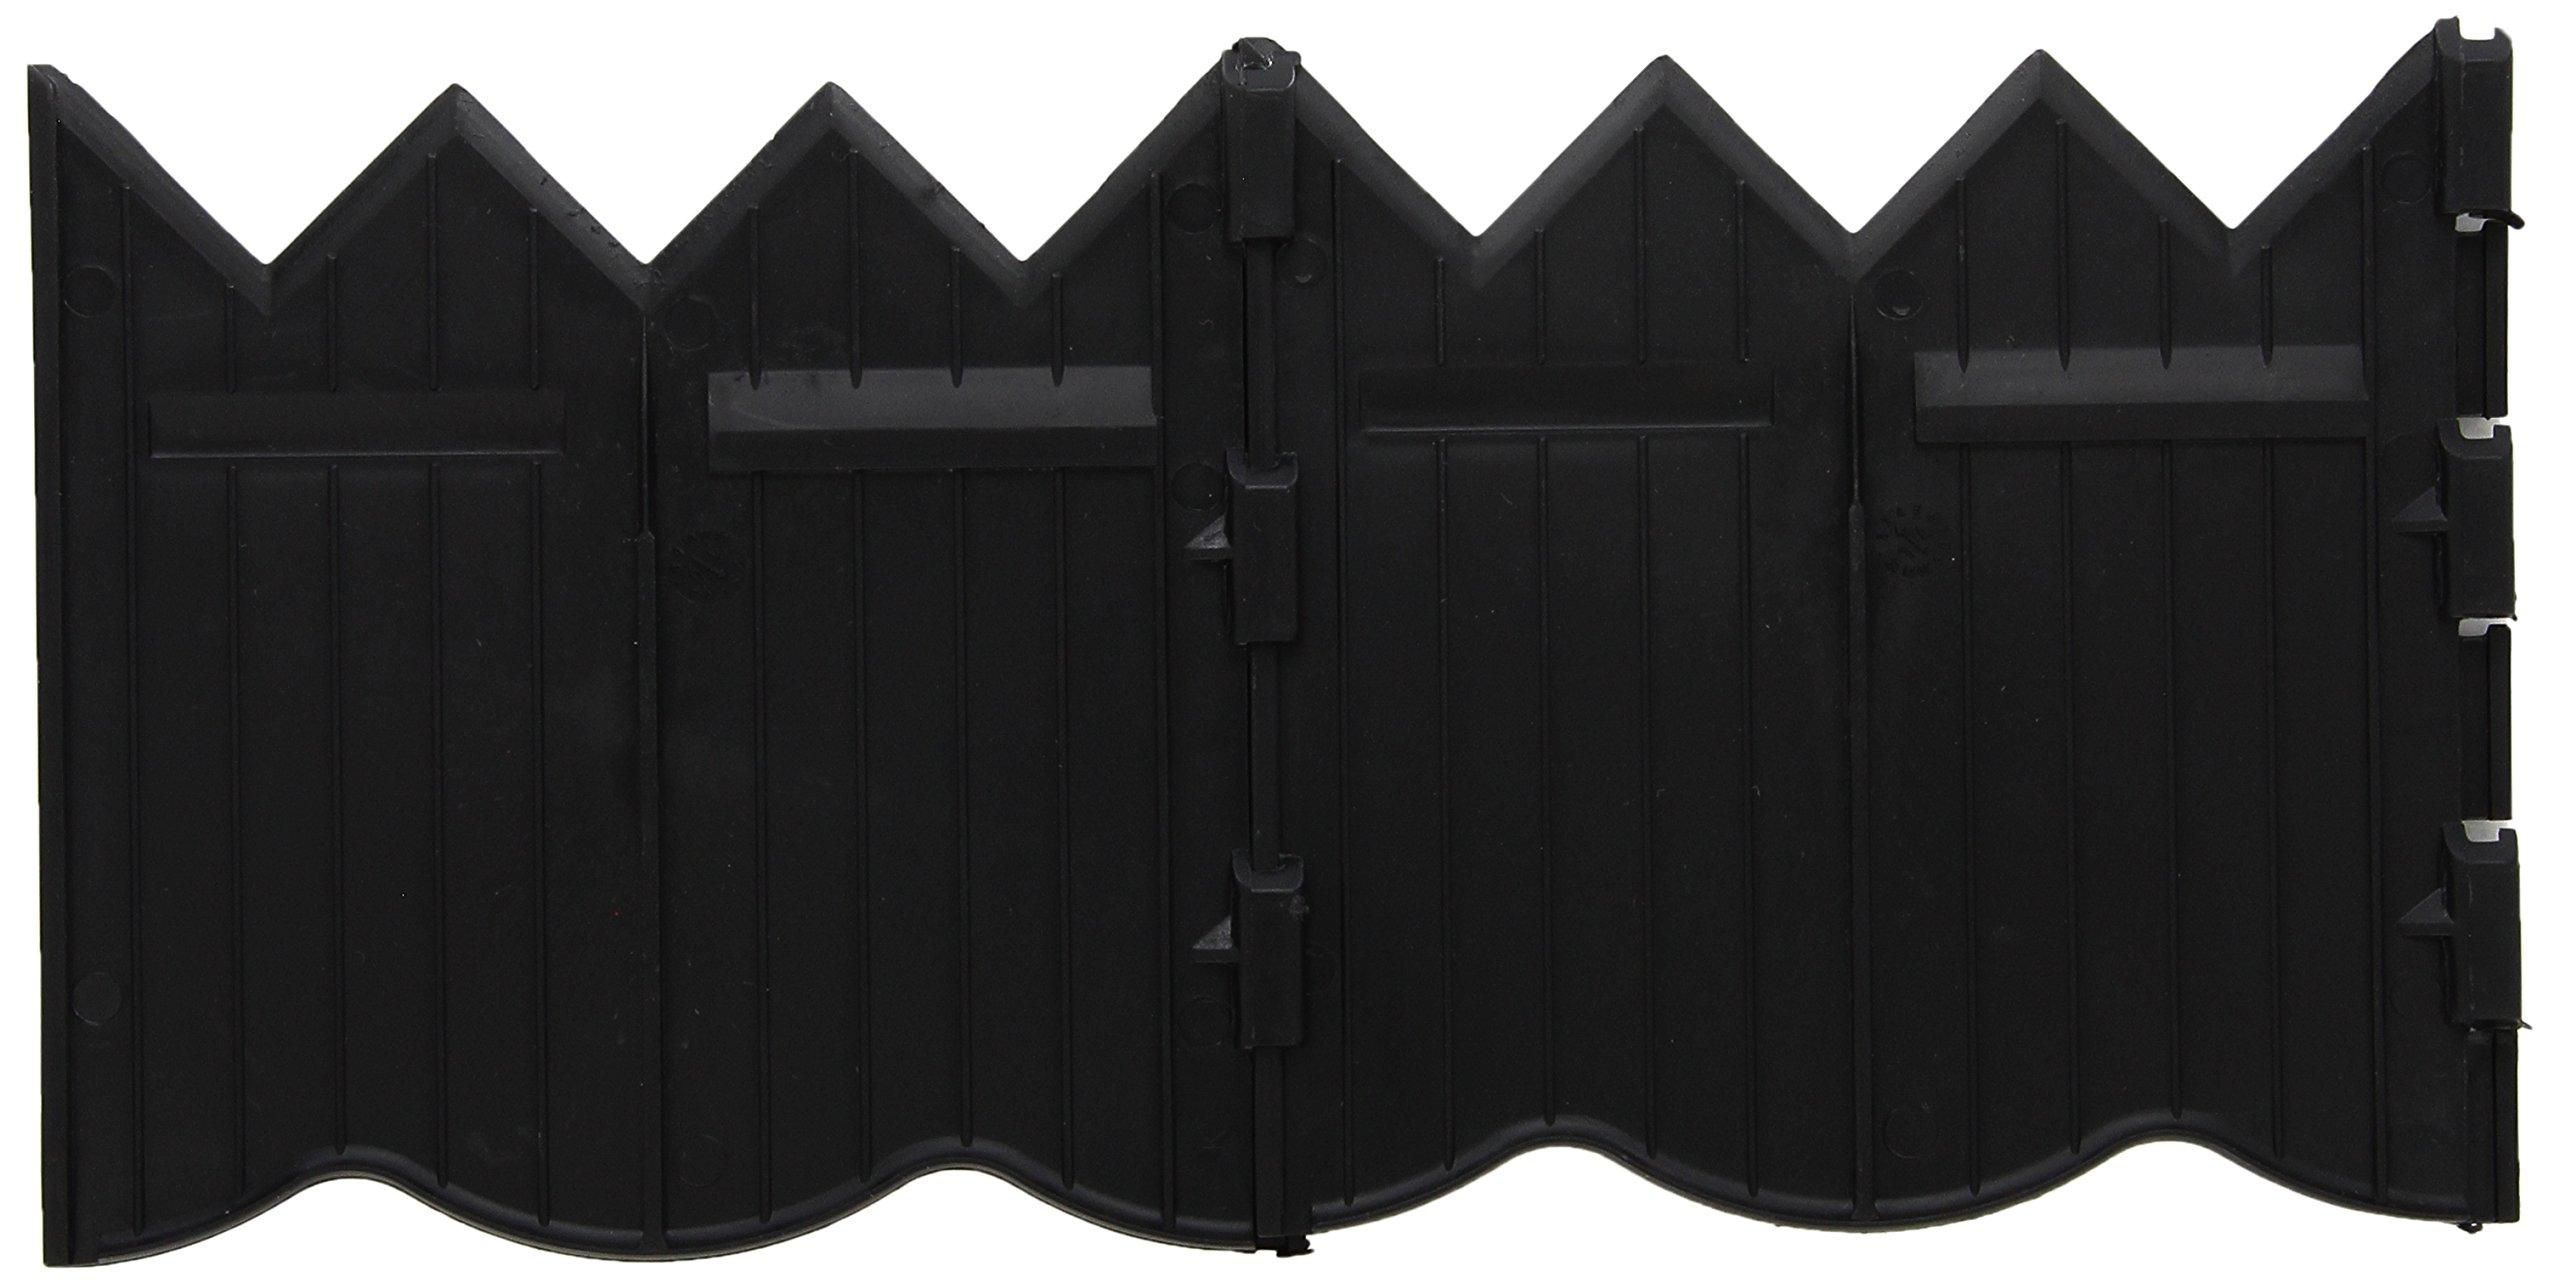 Master Mark Plastics 97220 BorderMaster Poundable Edging 6